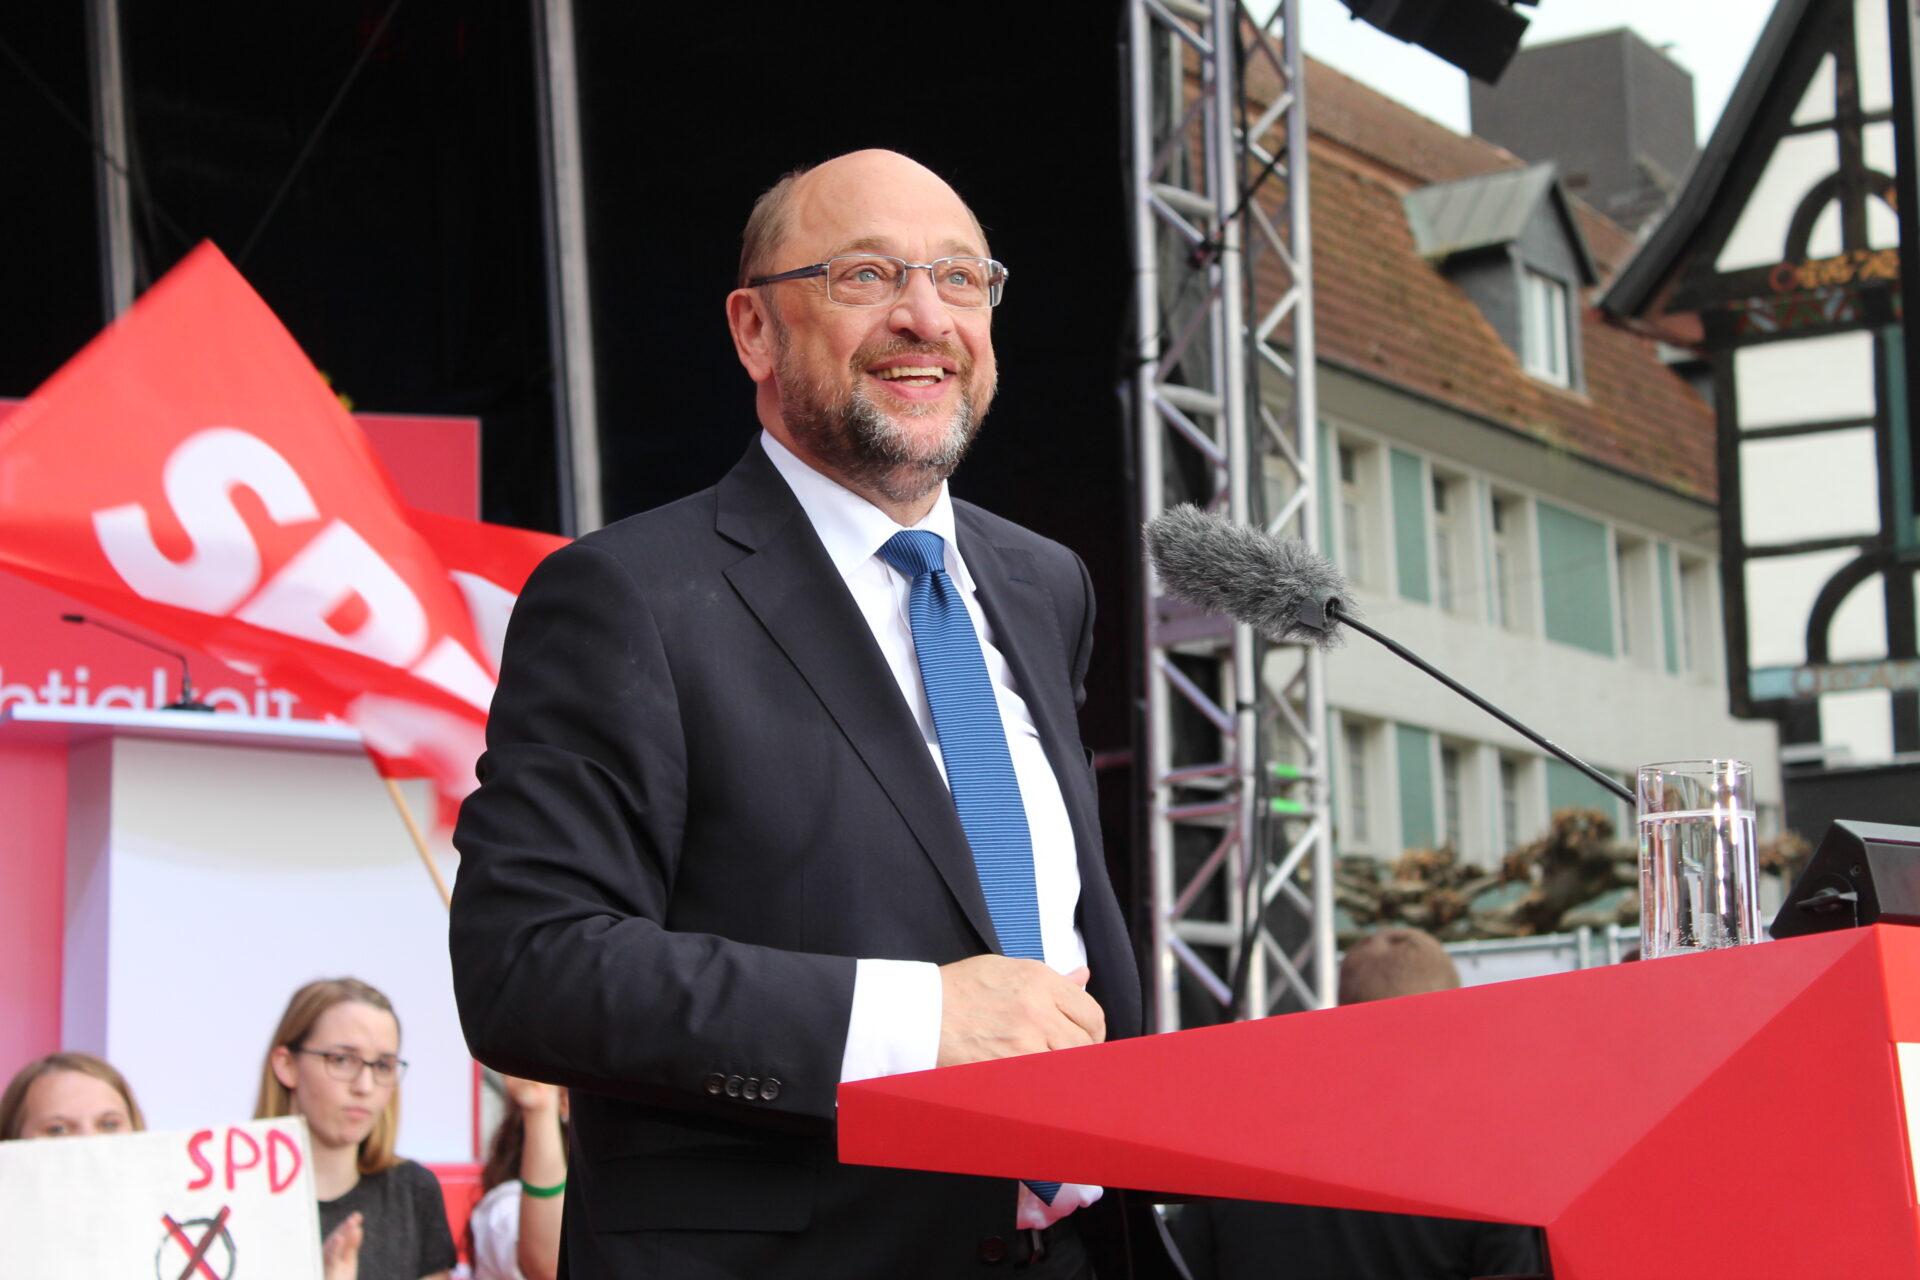 Martin Schulz live in Unna